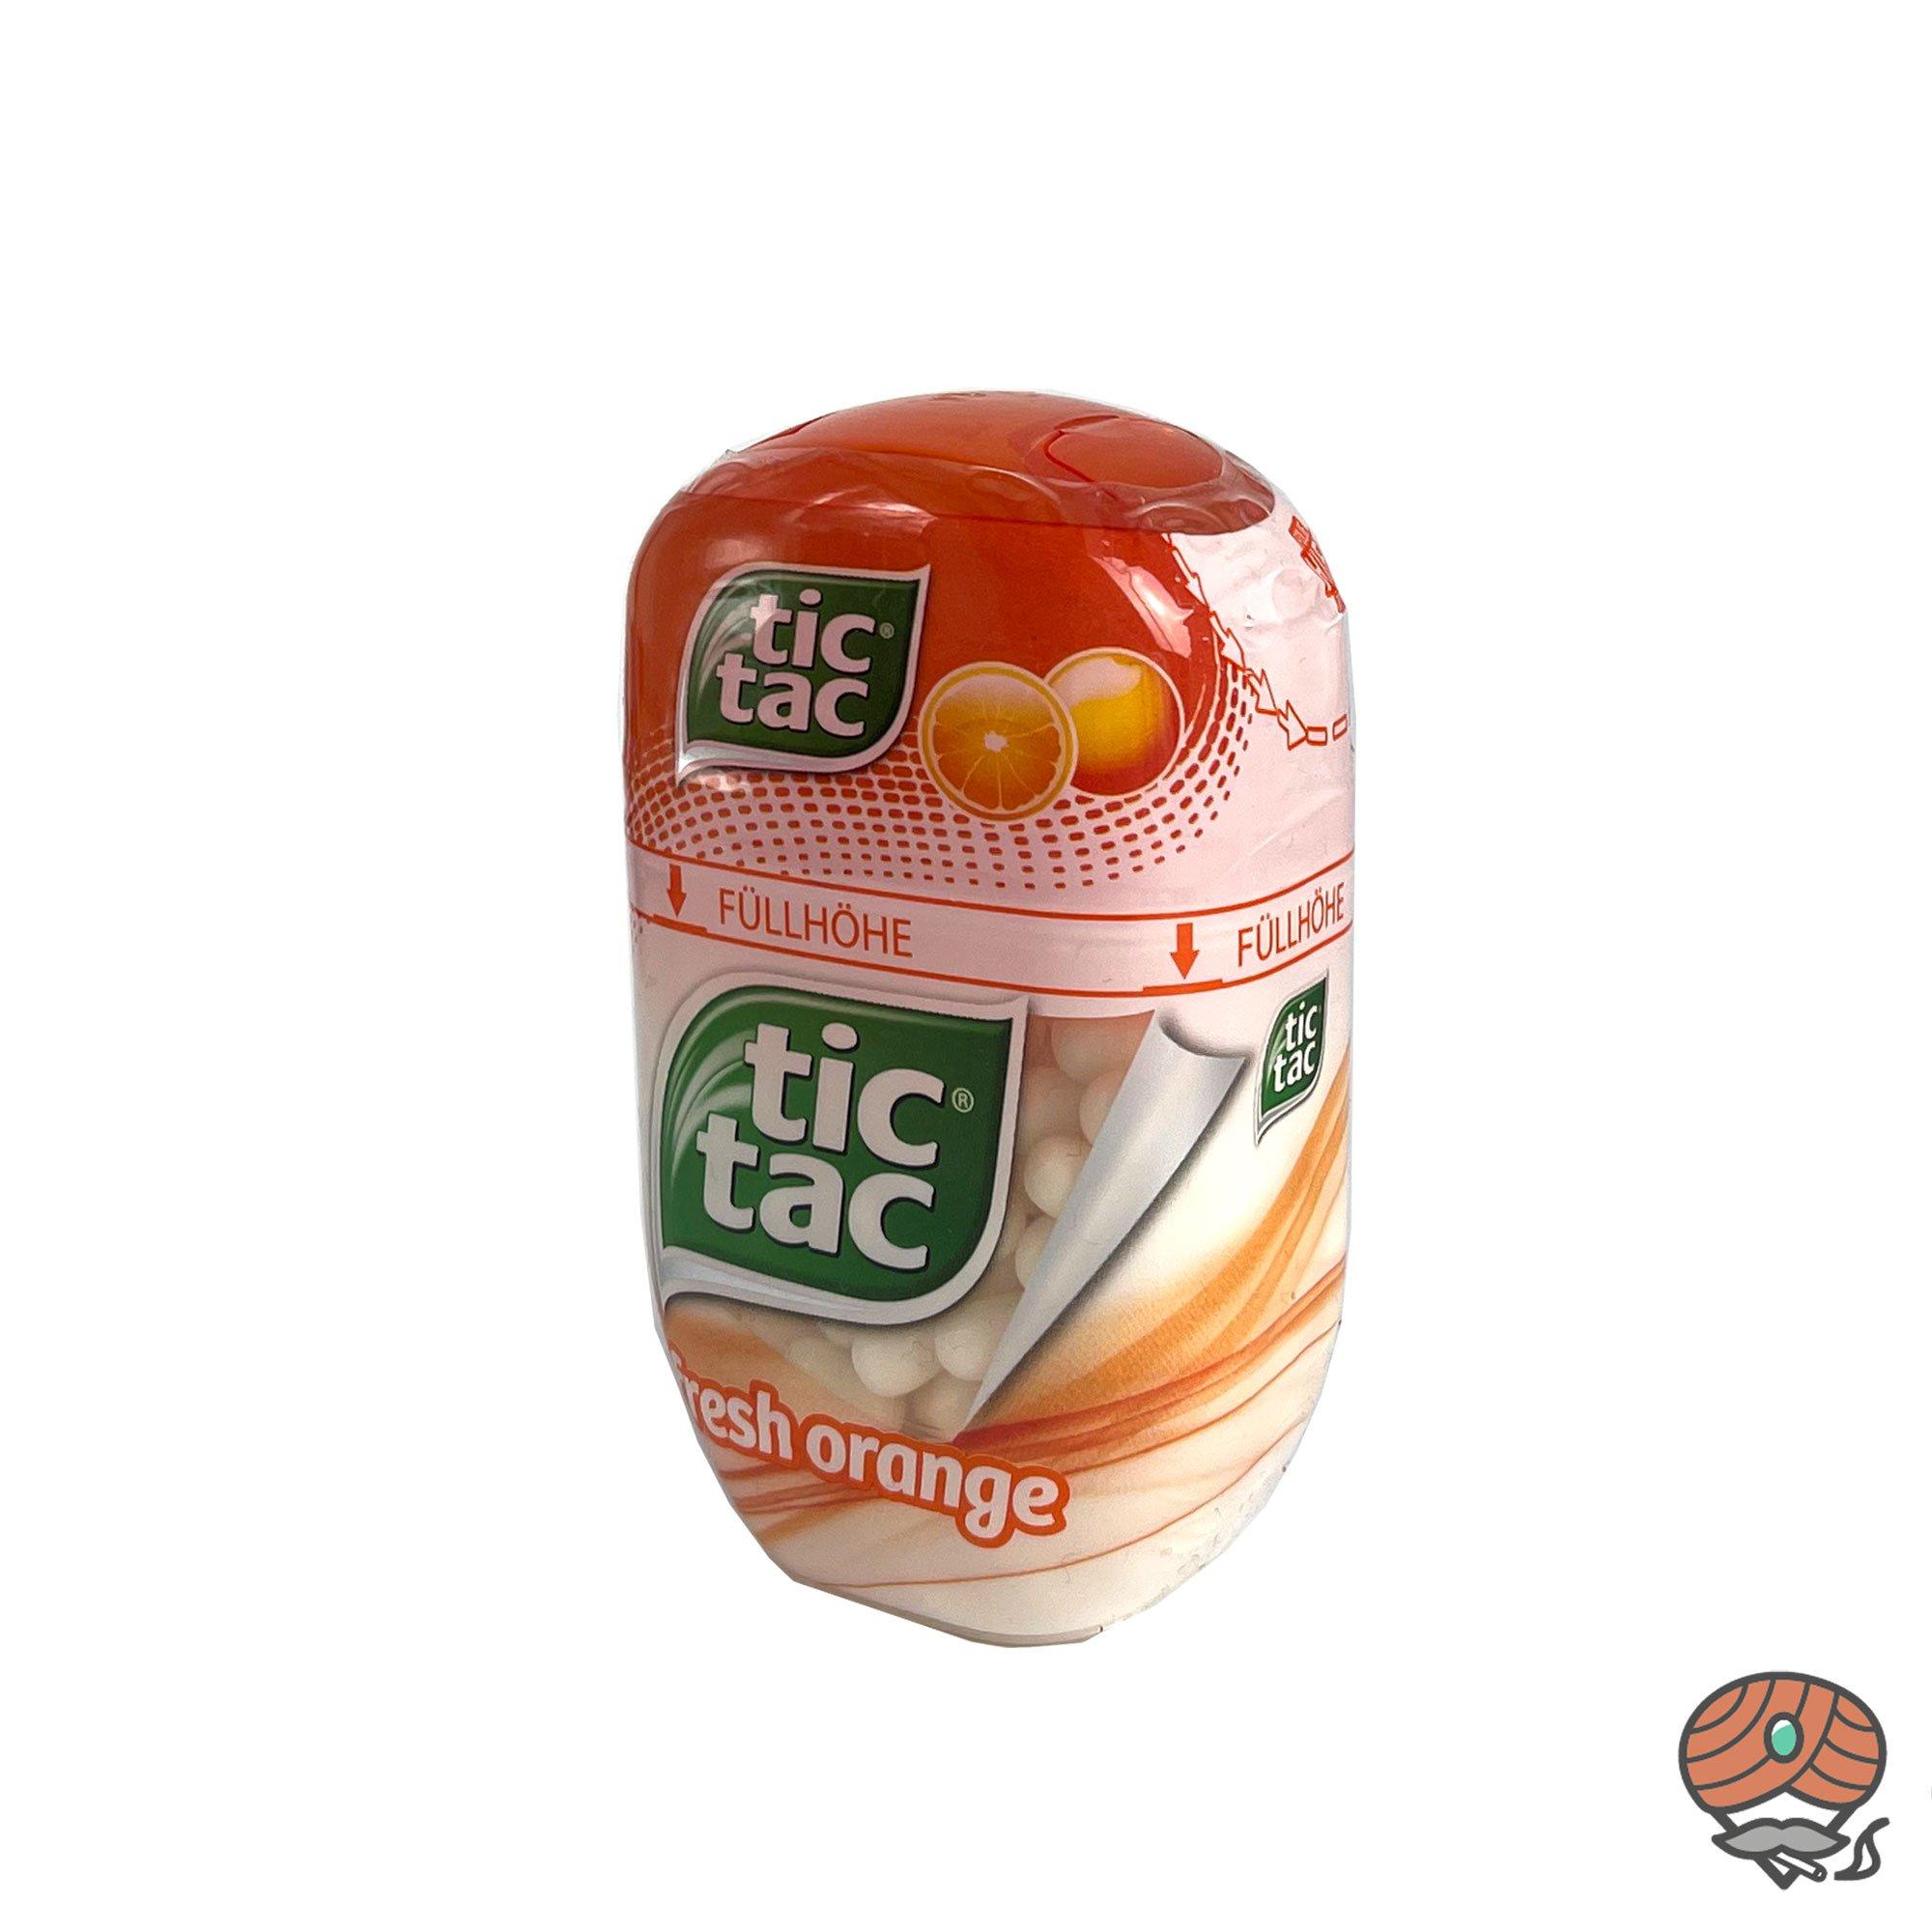 Tic Tac fresh orange Dragees Inhalt 98g